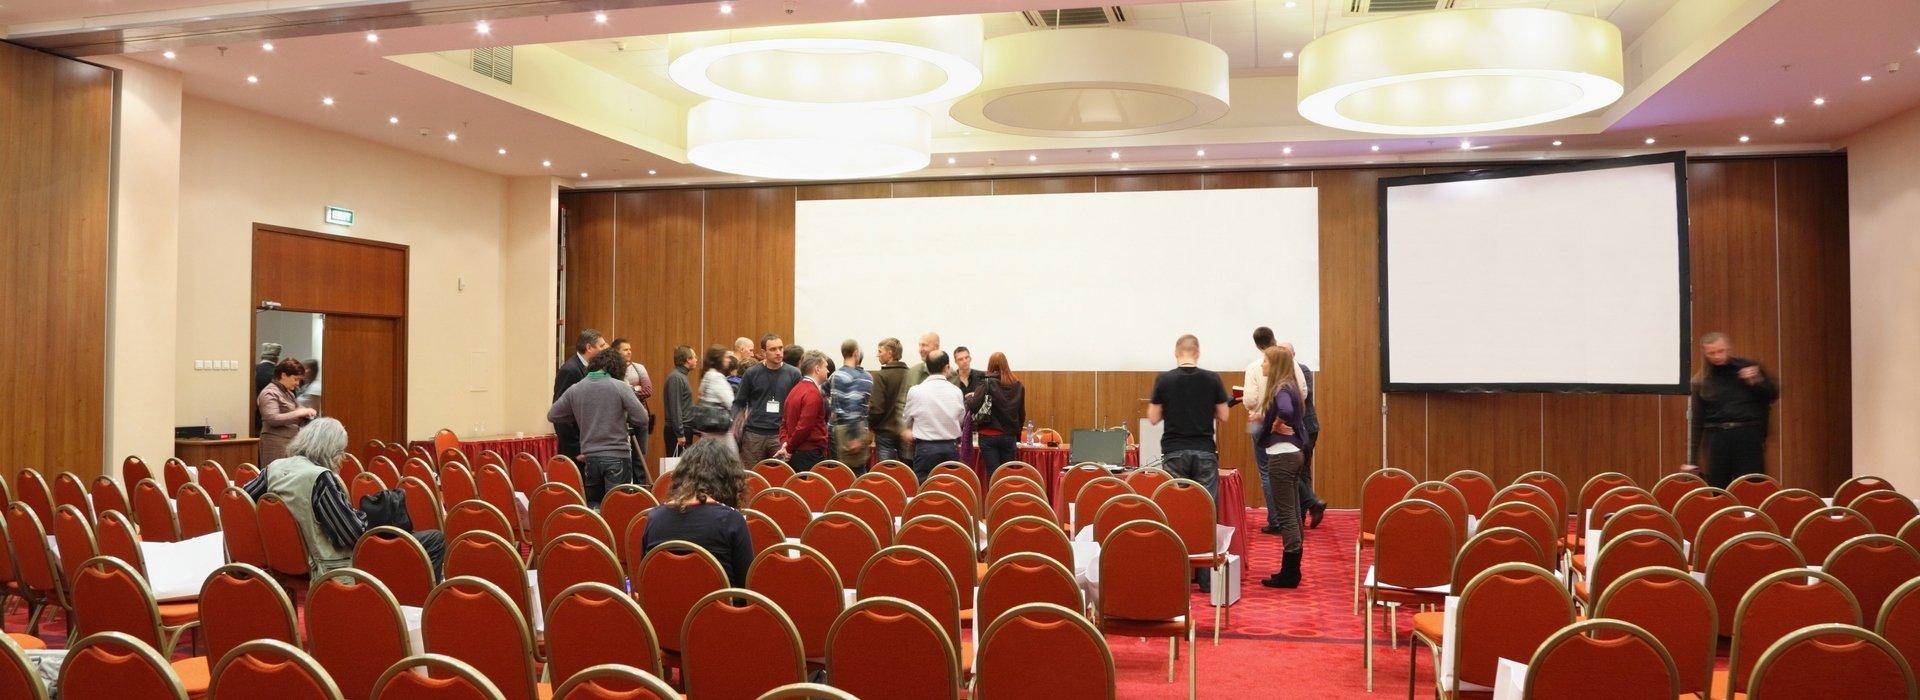 Budapesti Rendezvények – Konferenciák Budapesten